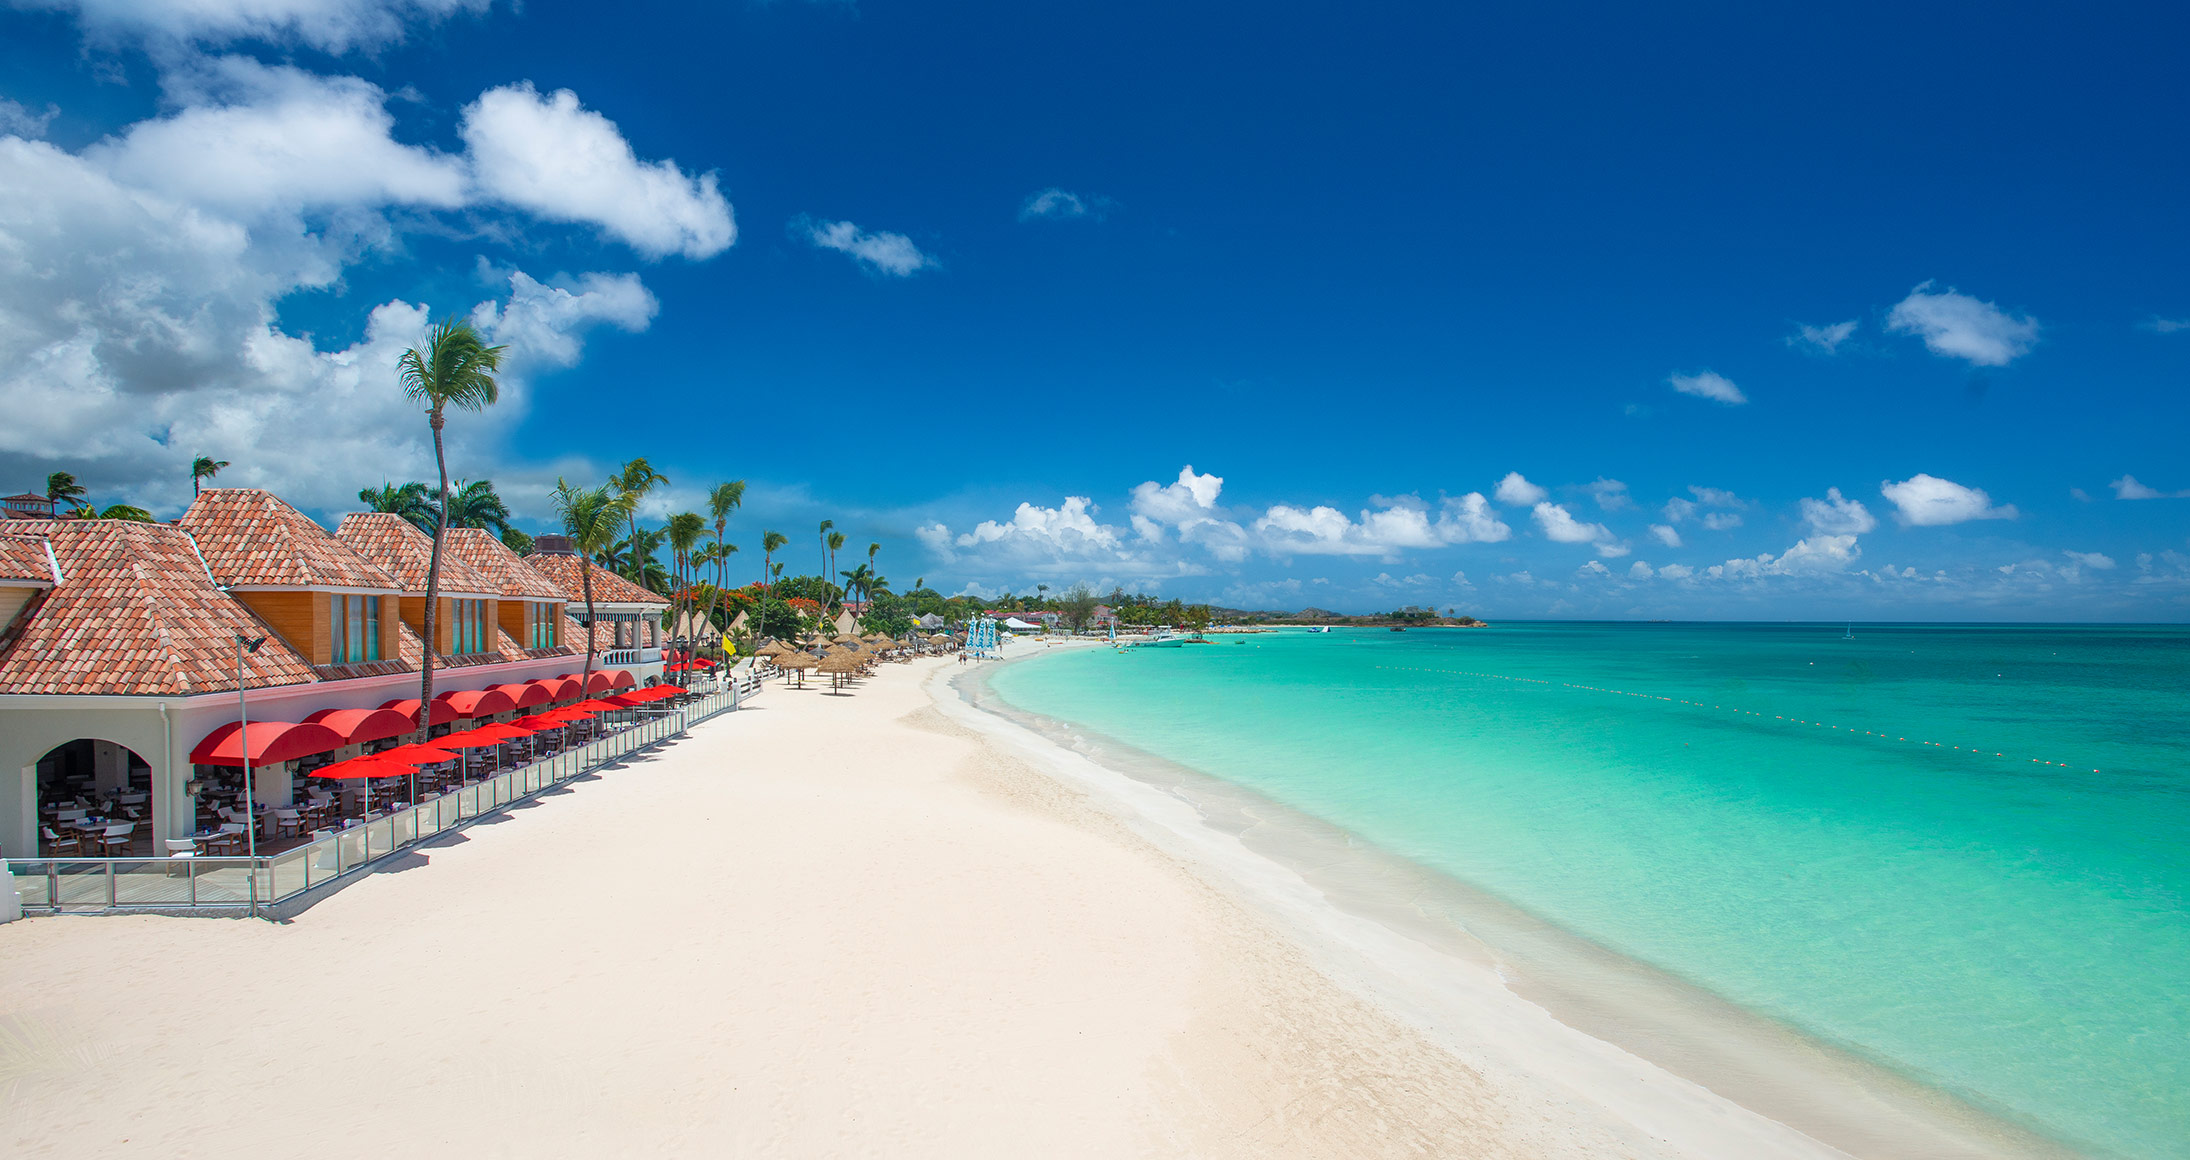 1a2599638 Sandals Grande Antigua - All-Inclusive Luxury Resort in St. Johns